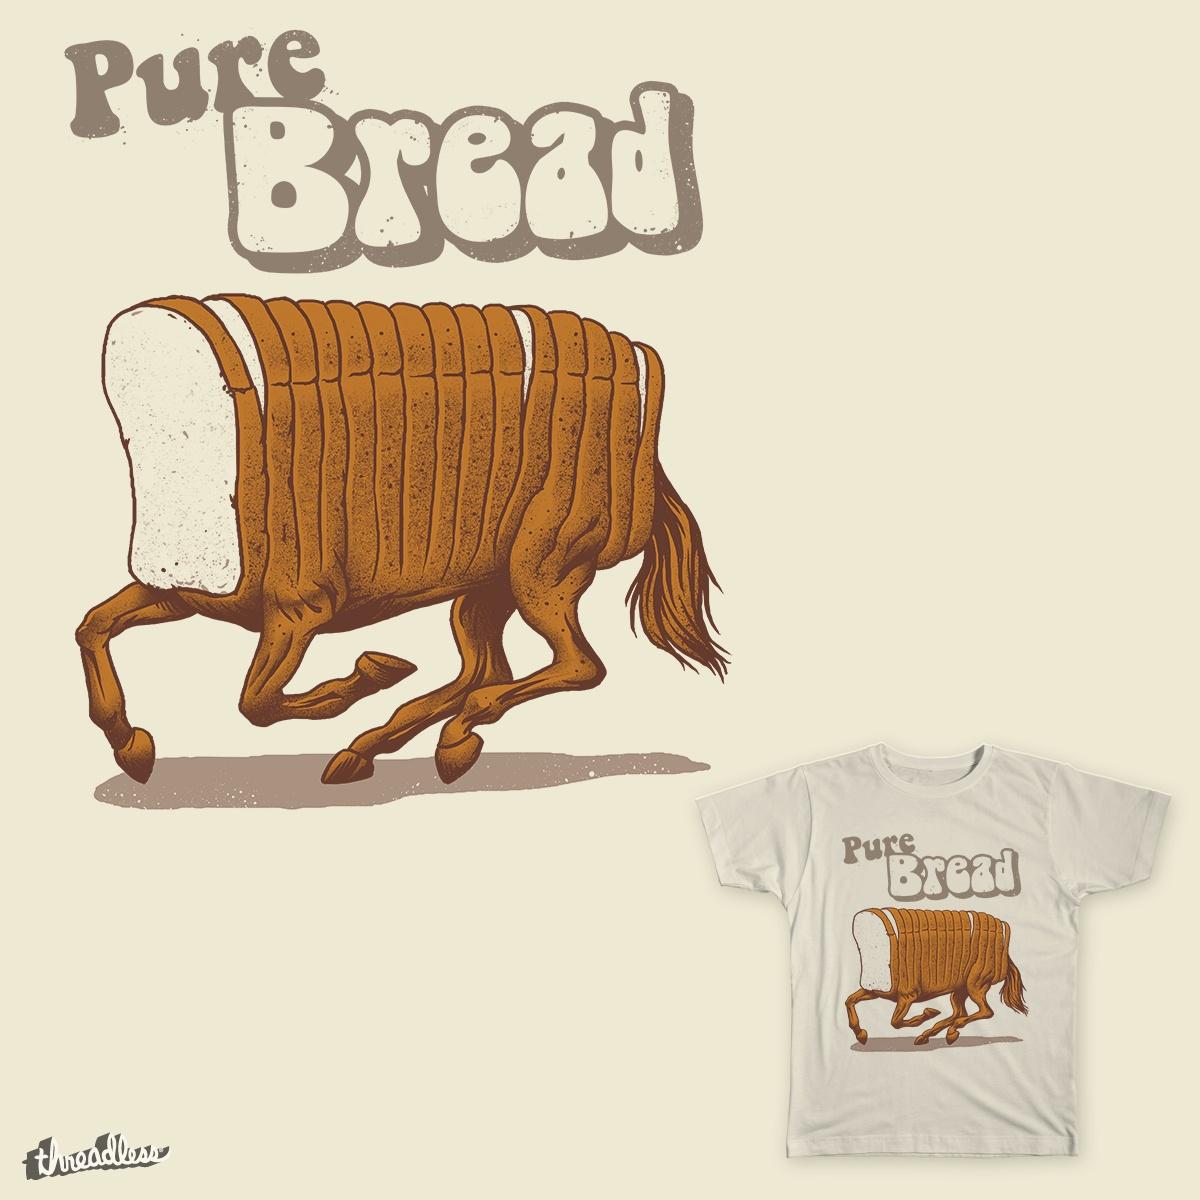 Pure Bread by vptrinidad021 on Threadless